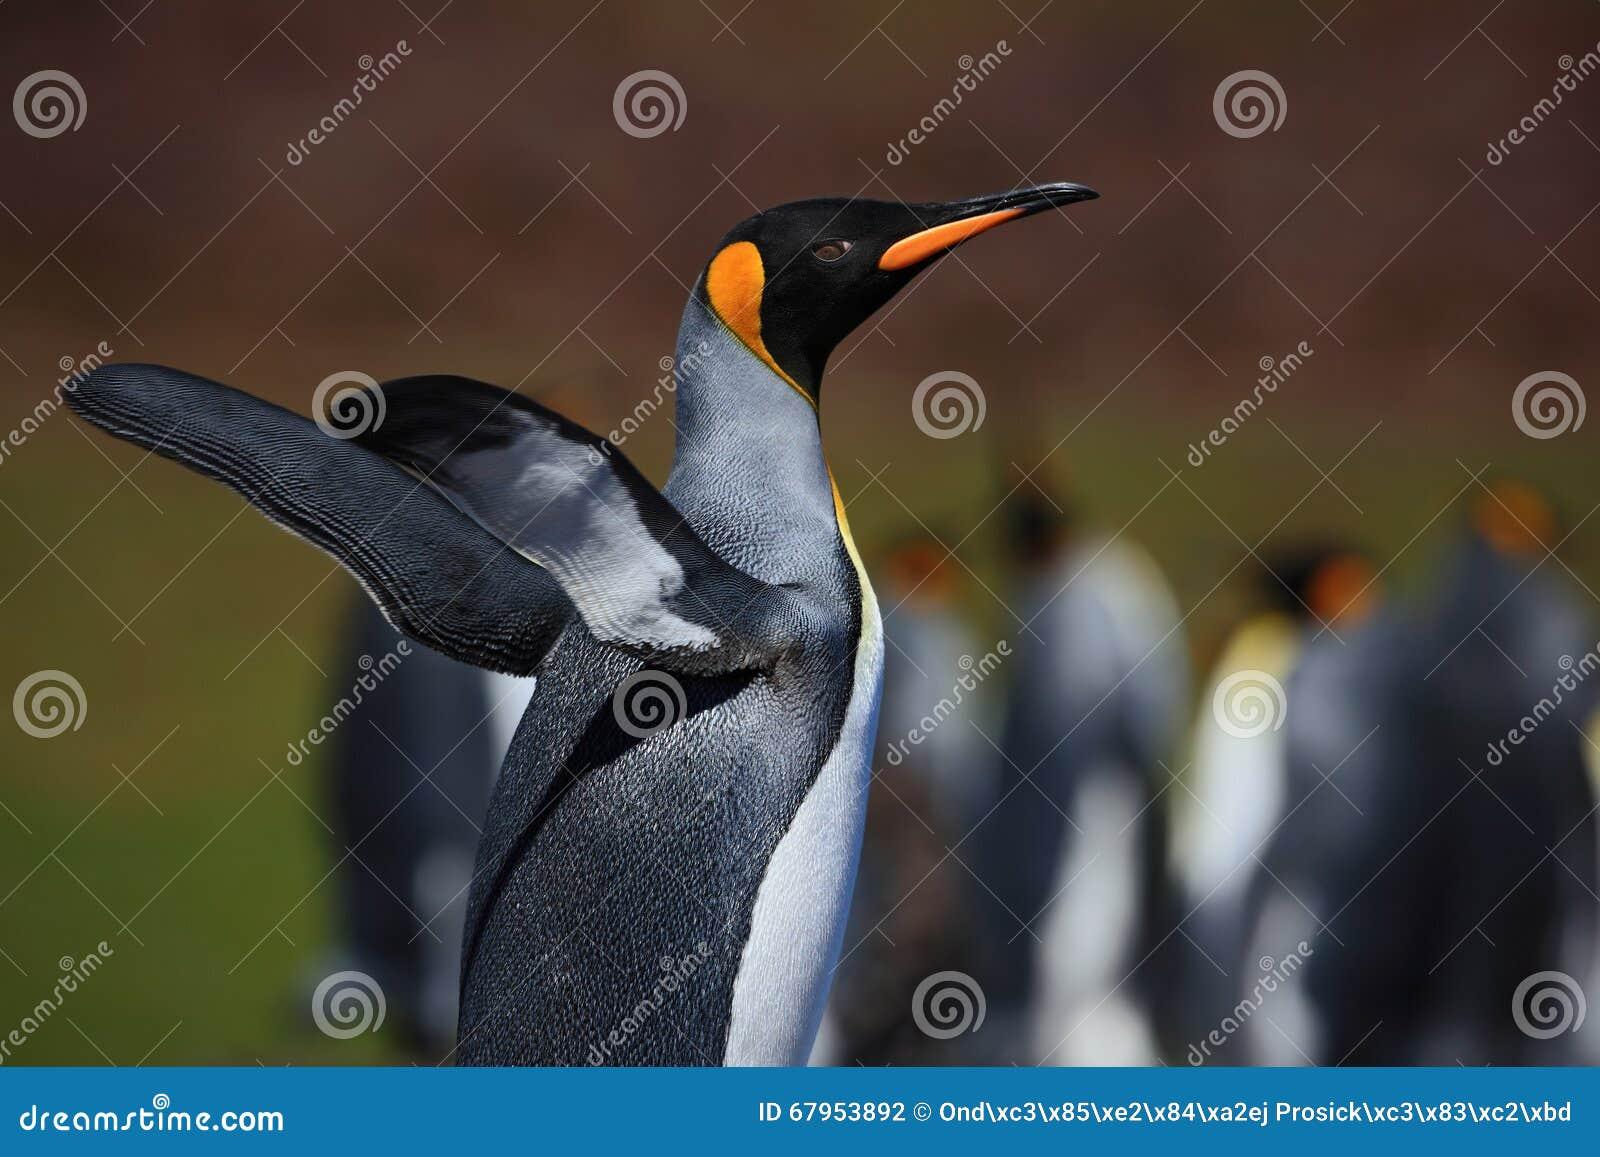 Koningspinguïn, Aptenodytes-patagonicus met uitgespreide vleugels, vage pinguïnen op achtergrond, Falkland Islands